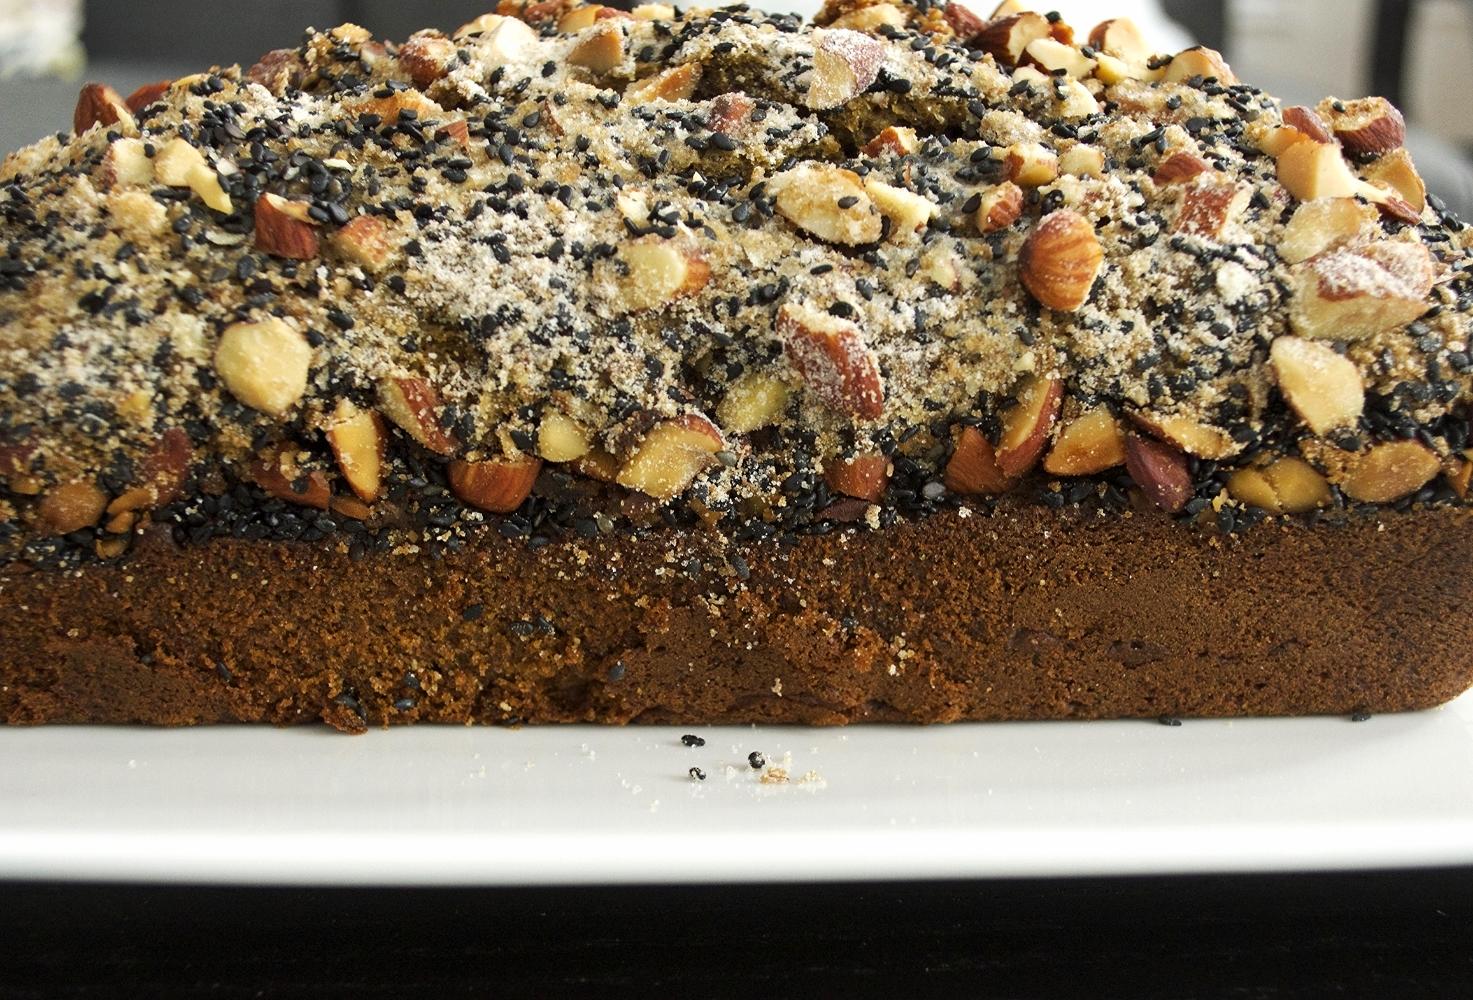 matcha-banana-bread-black-sesame-almond-crumble-side-whole.jpg